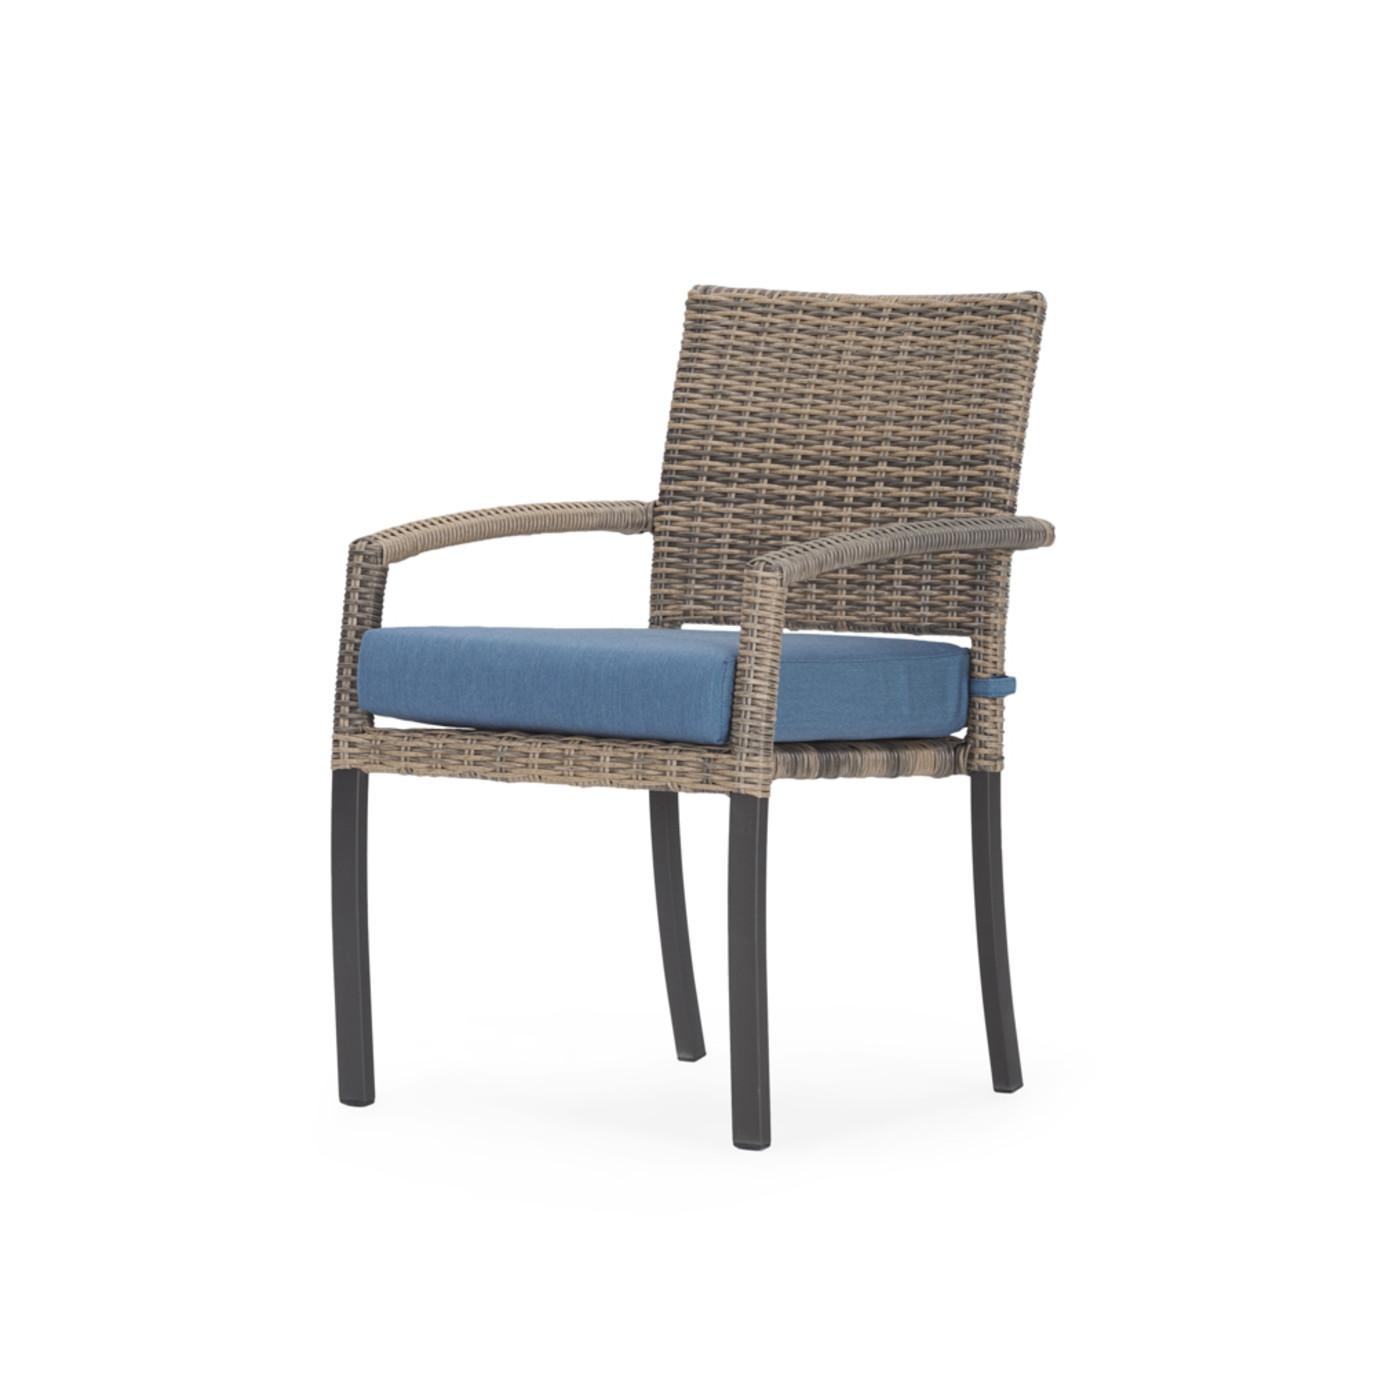 Portofino Affinity 6pc Dining Chairs - Newport Blue